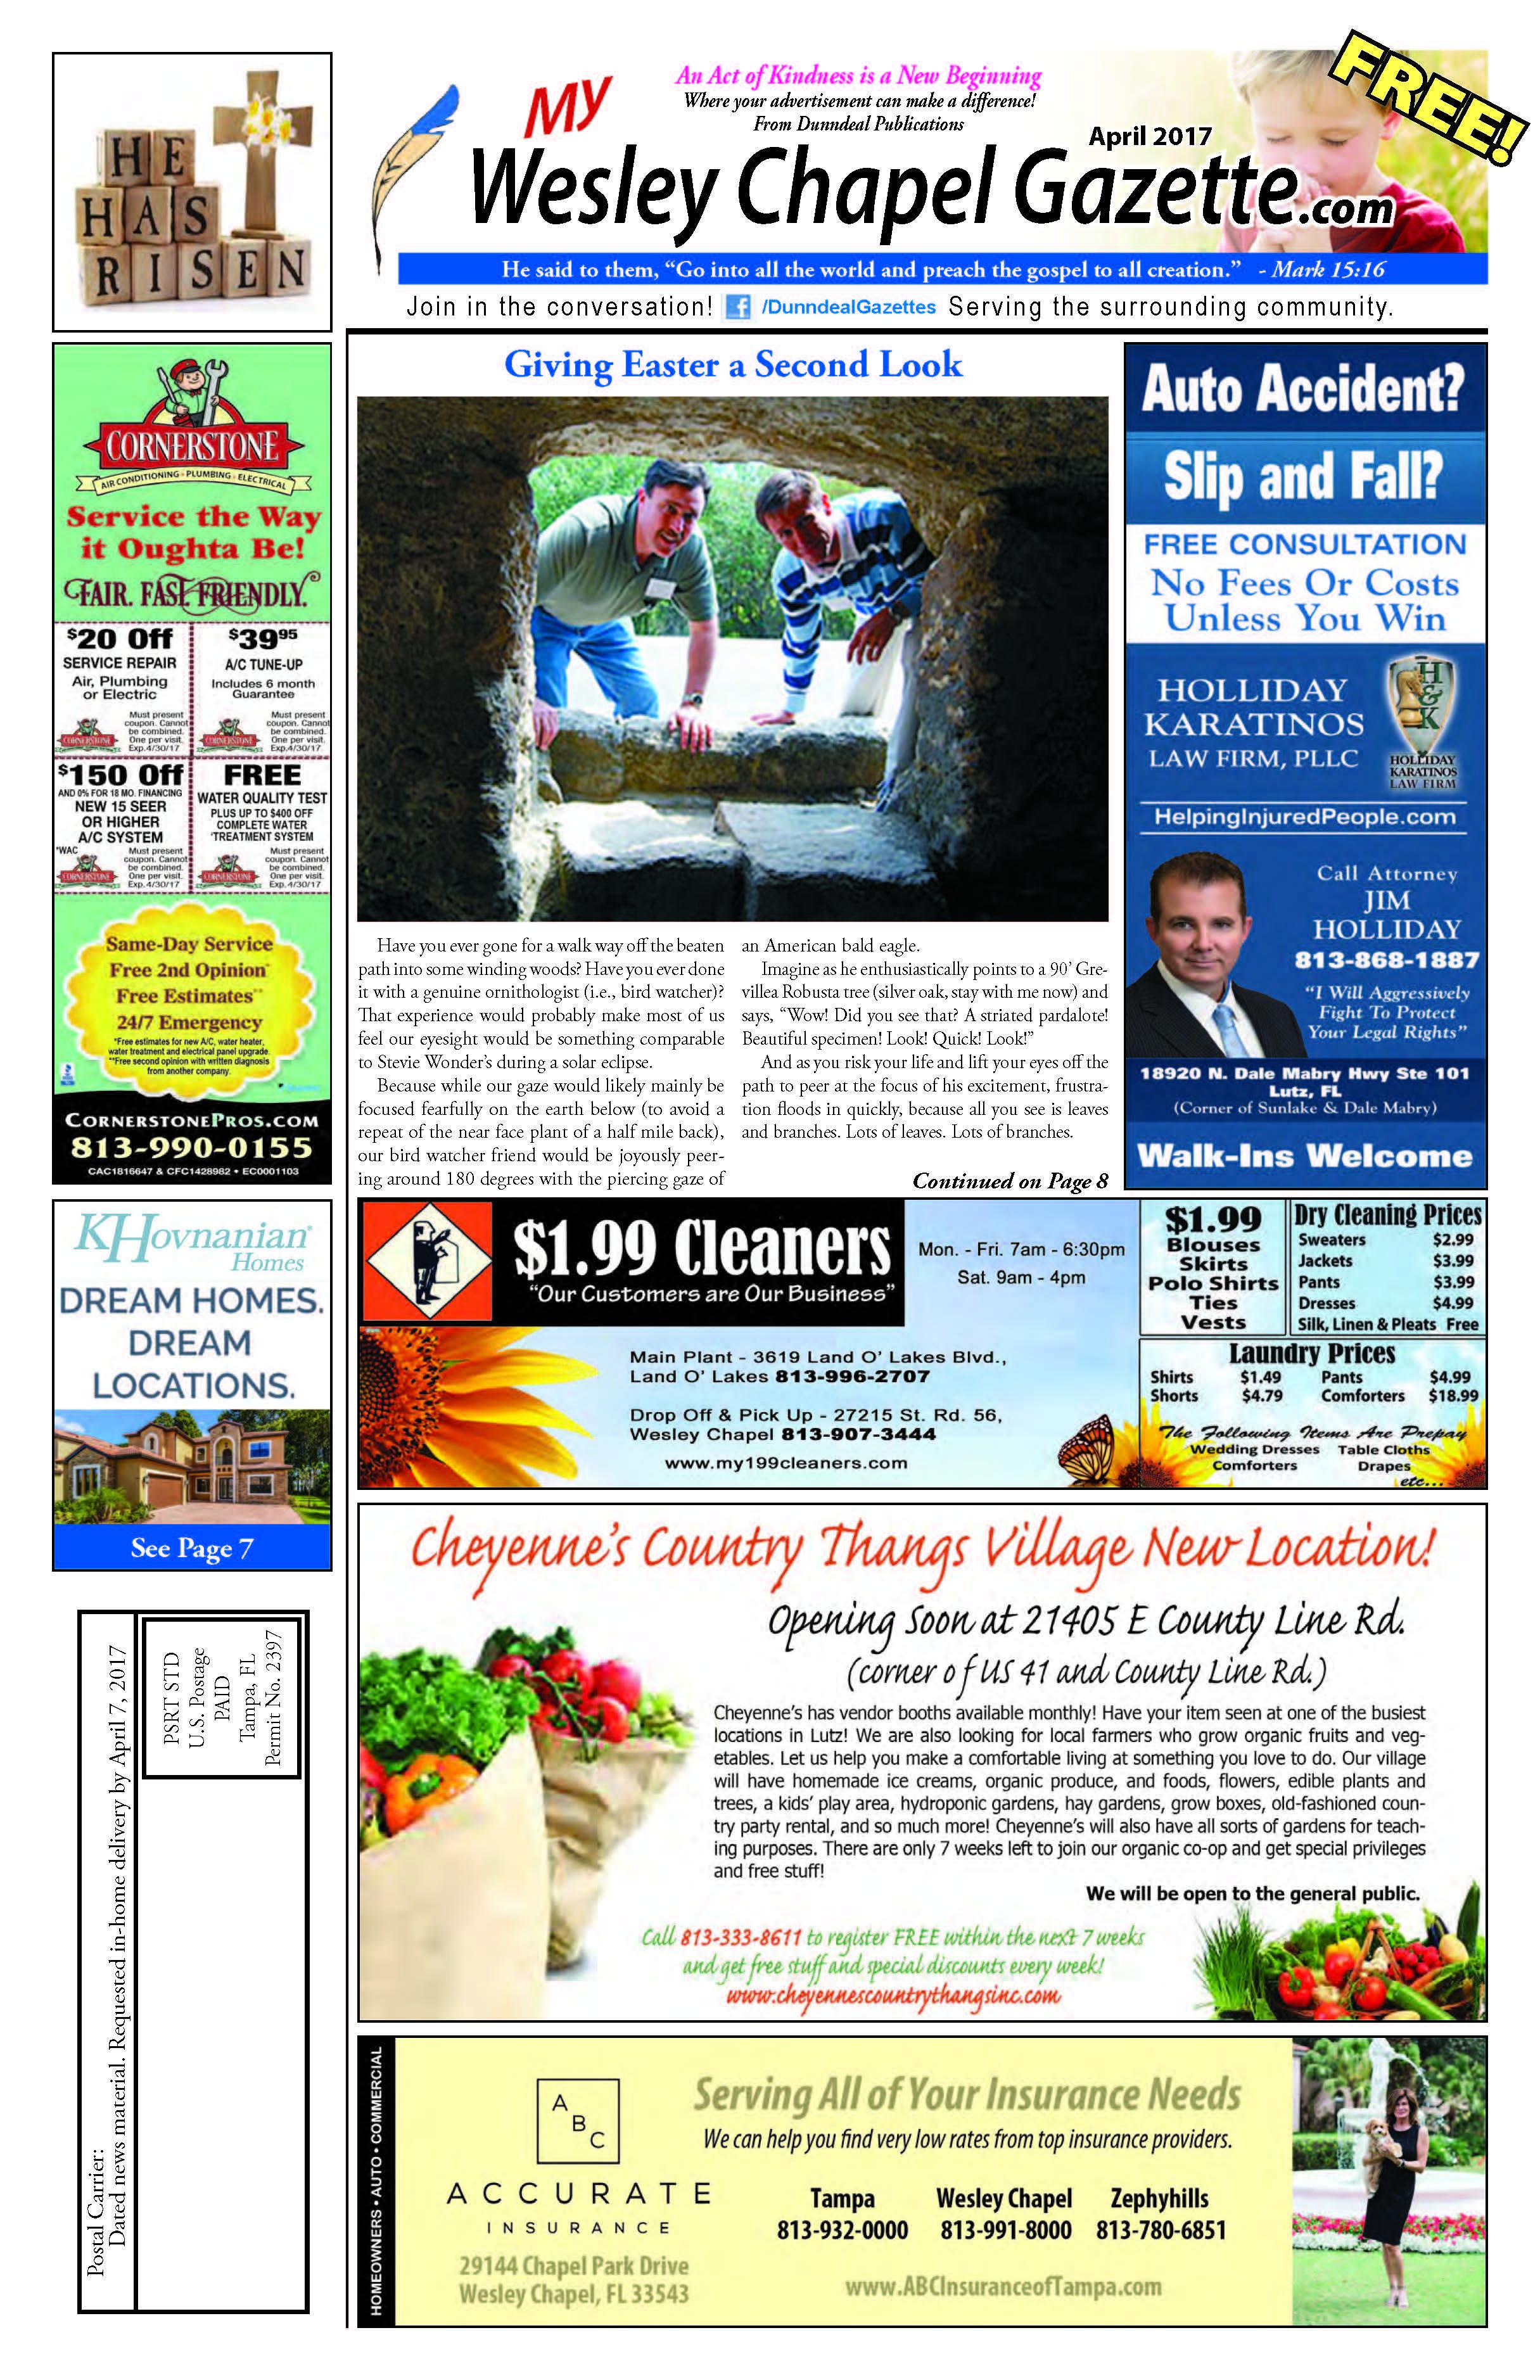 Wesley-Chapel-Gazette-April-2017_Page_01.jpg